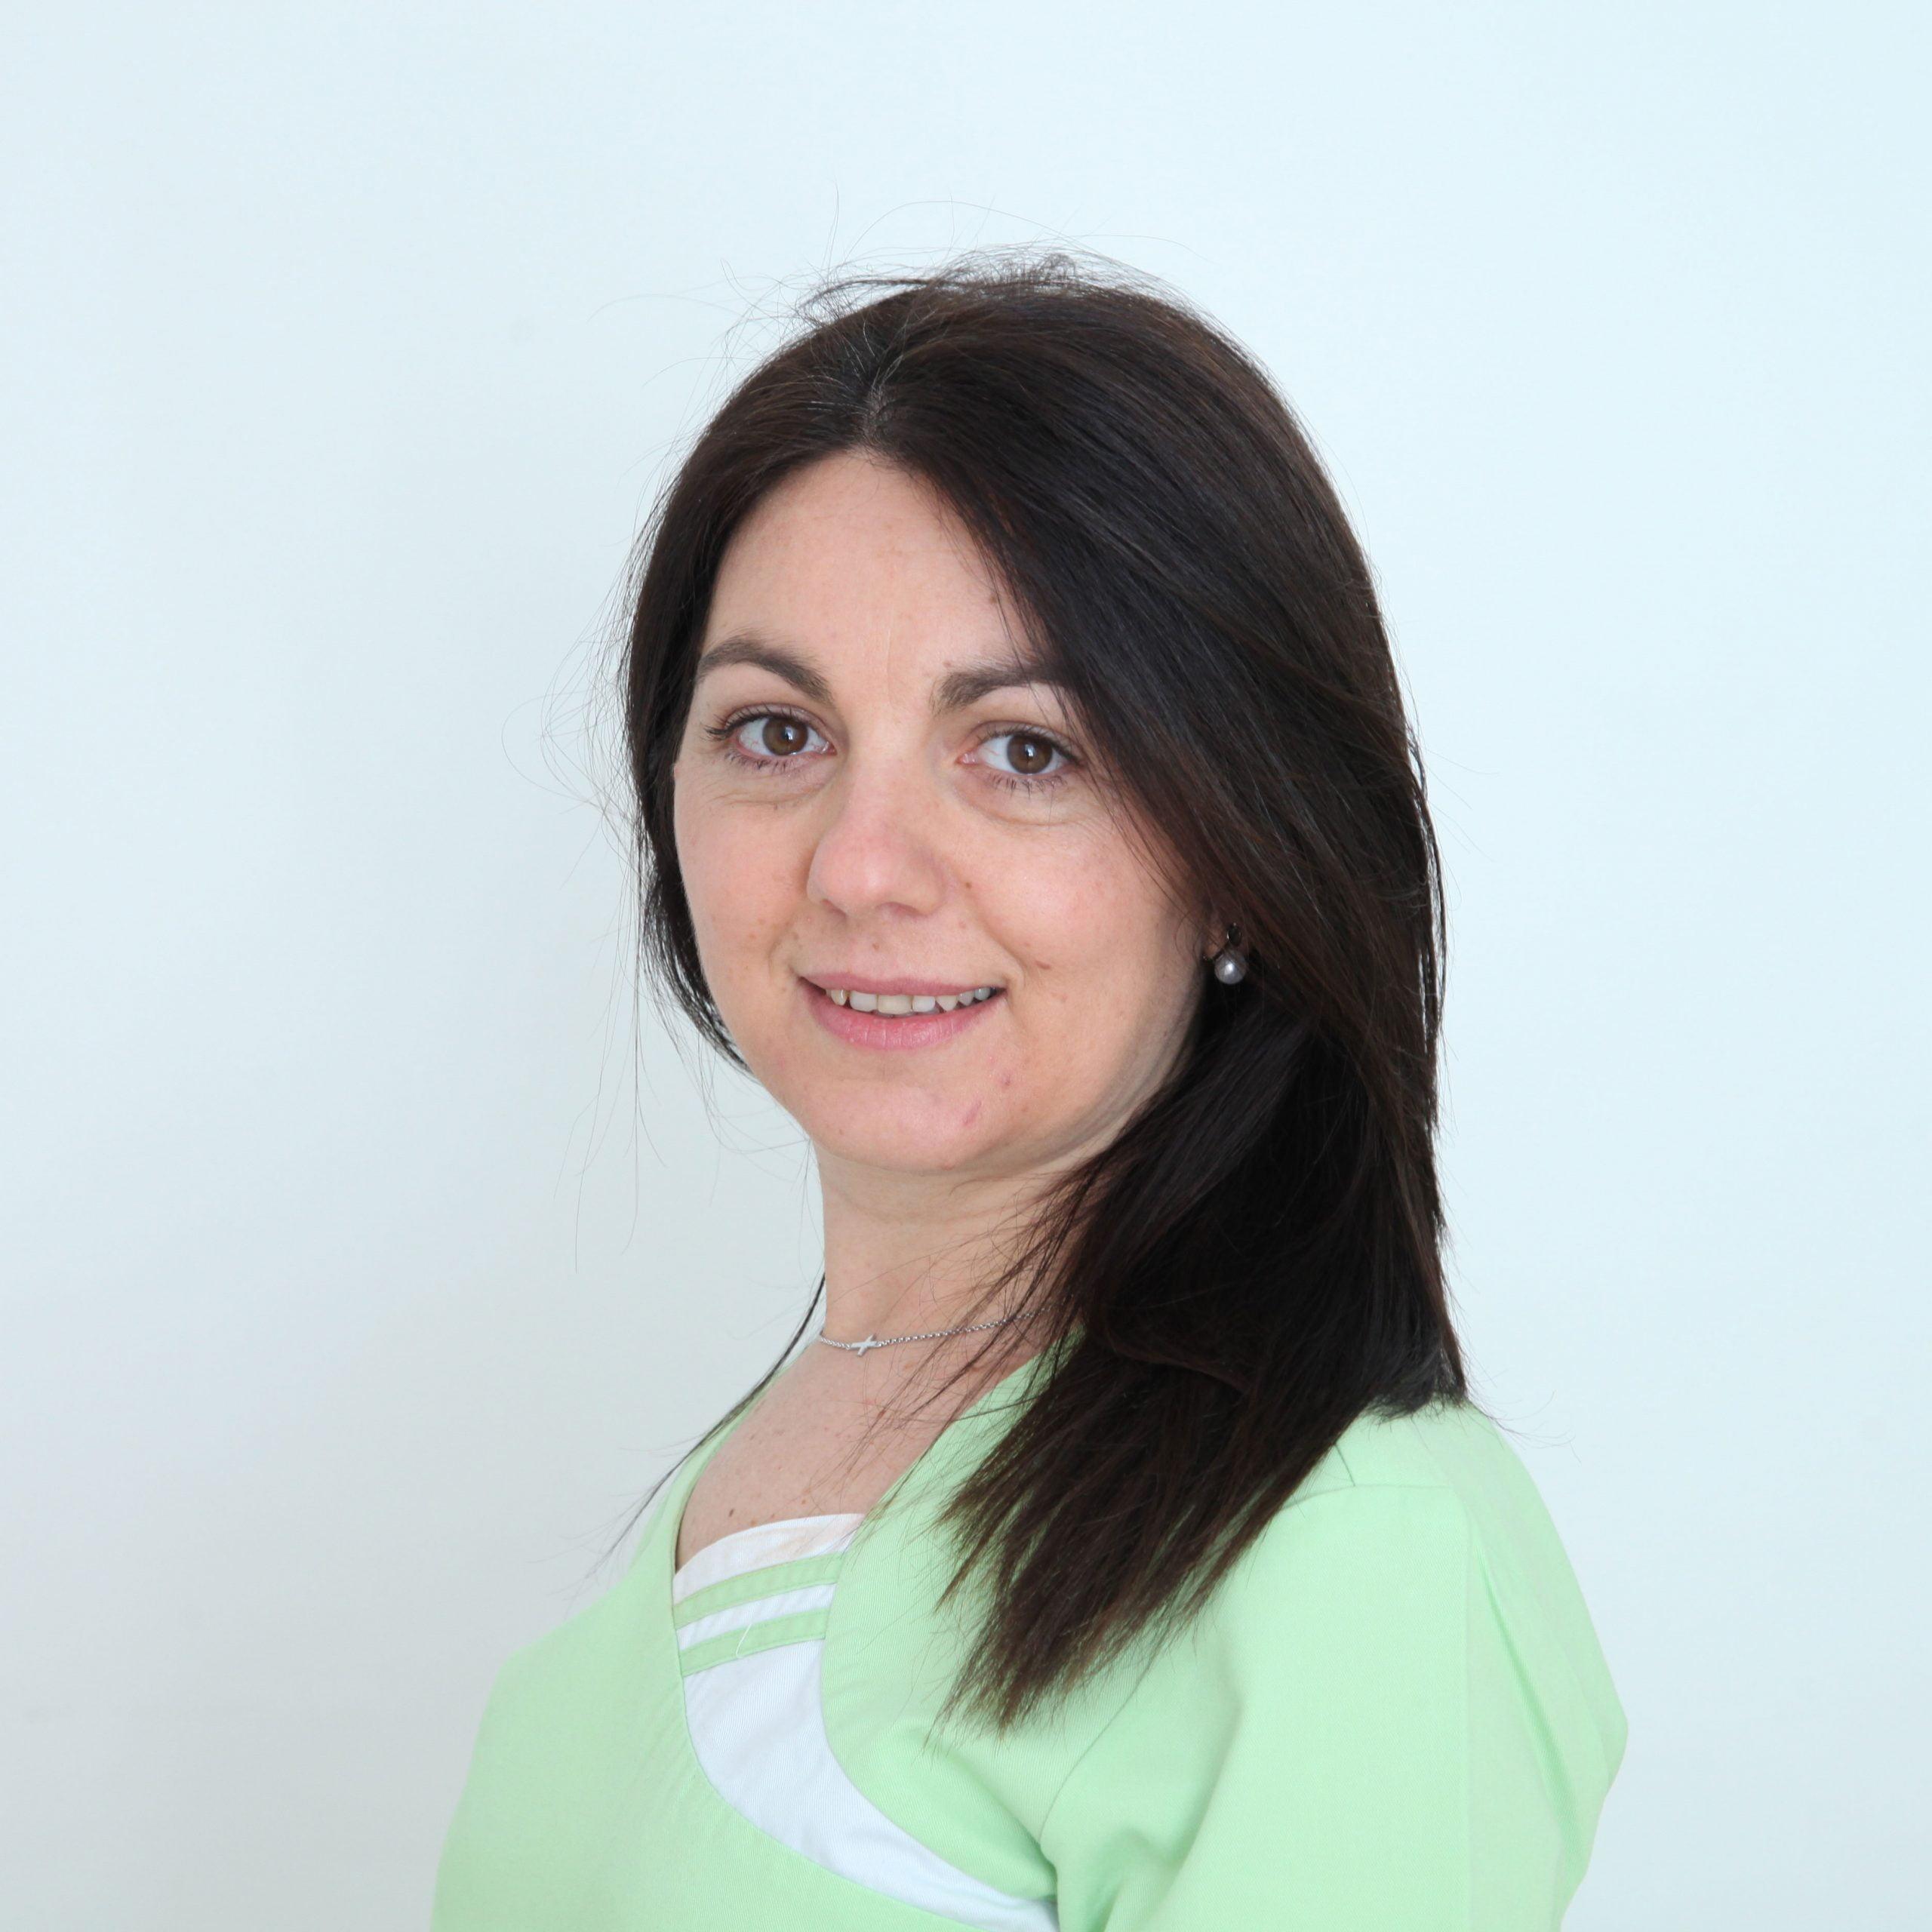 Angela Arlotta